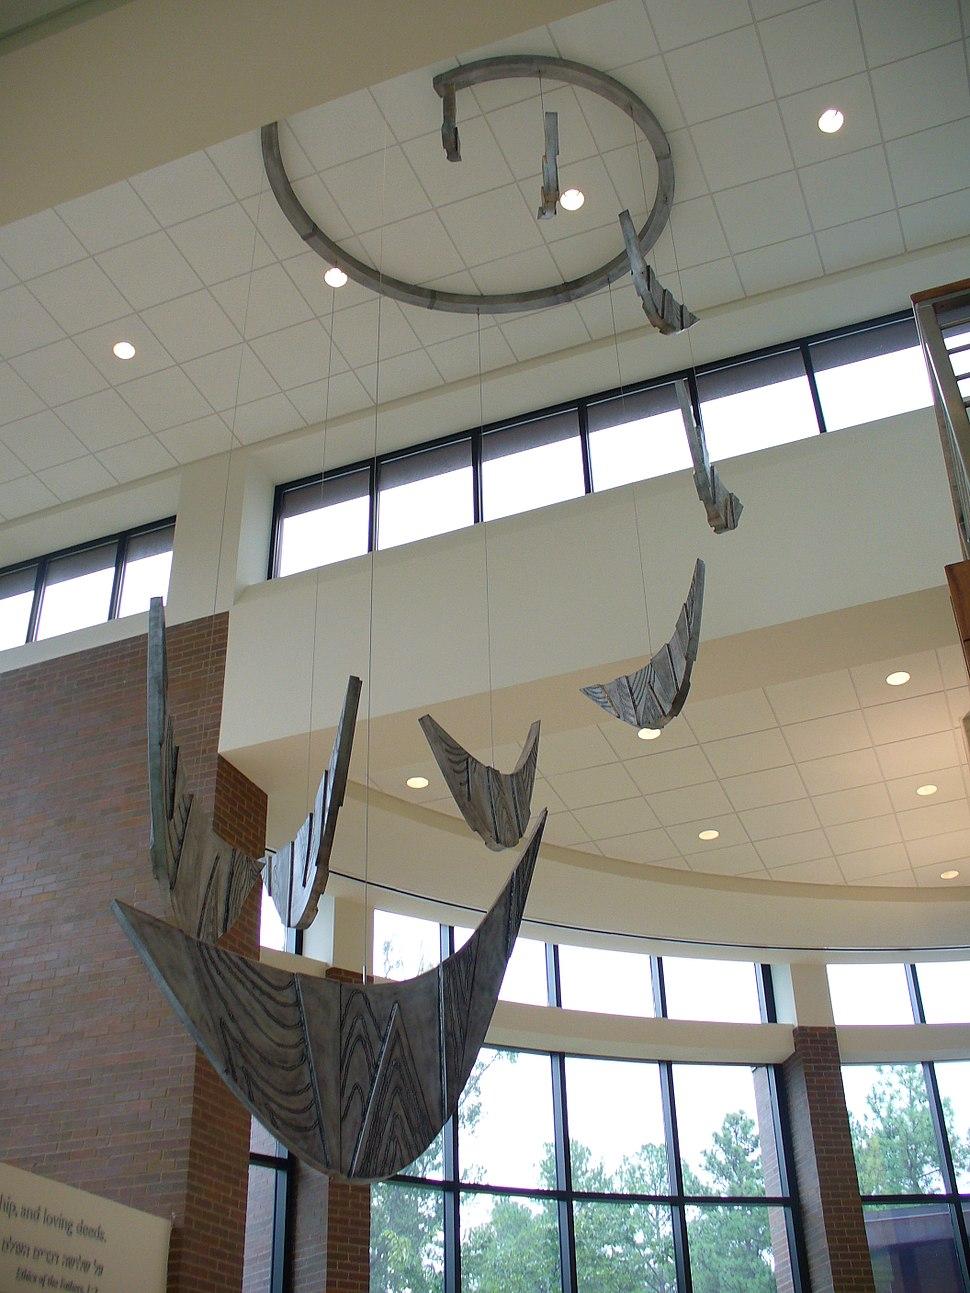 David Ascalon Kinetic Sculpture Mobile memphis TN